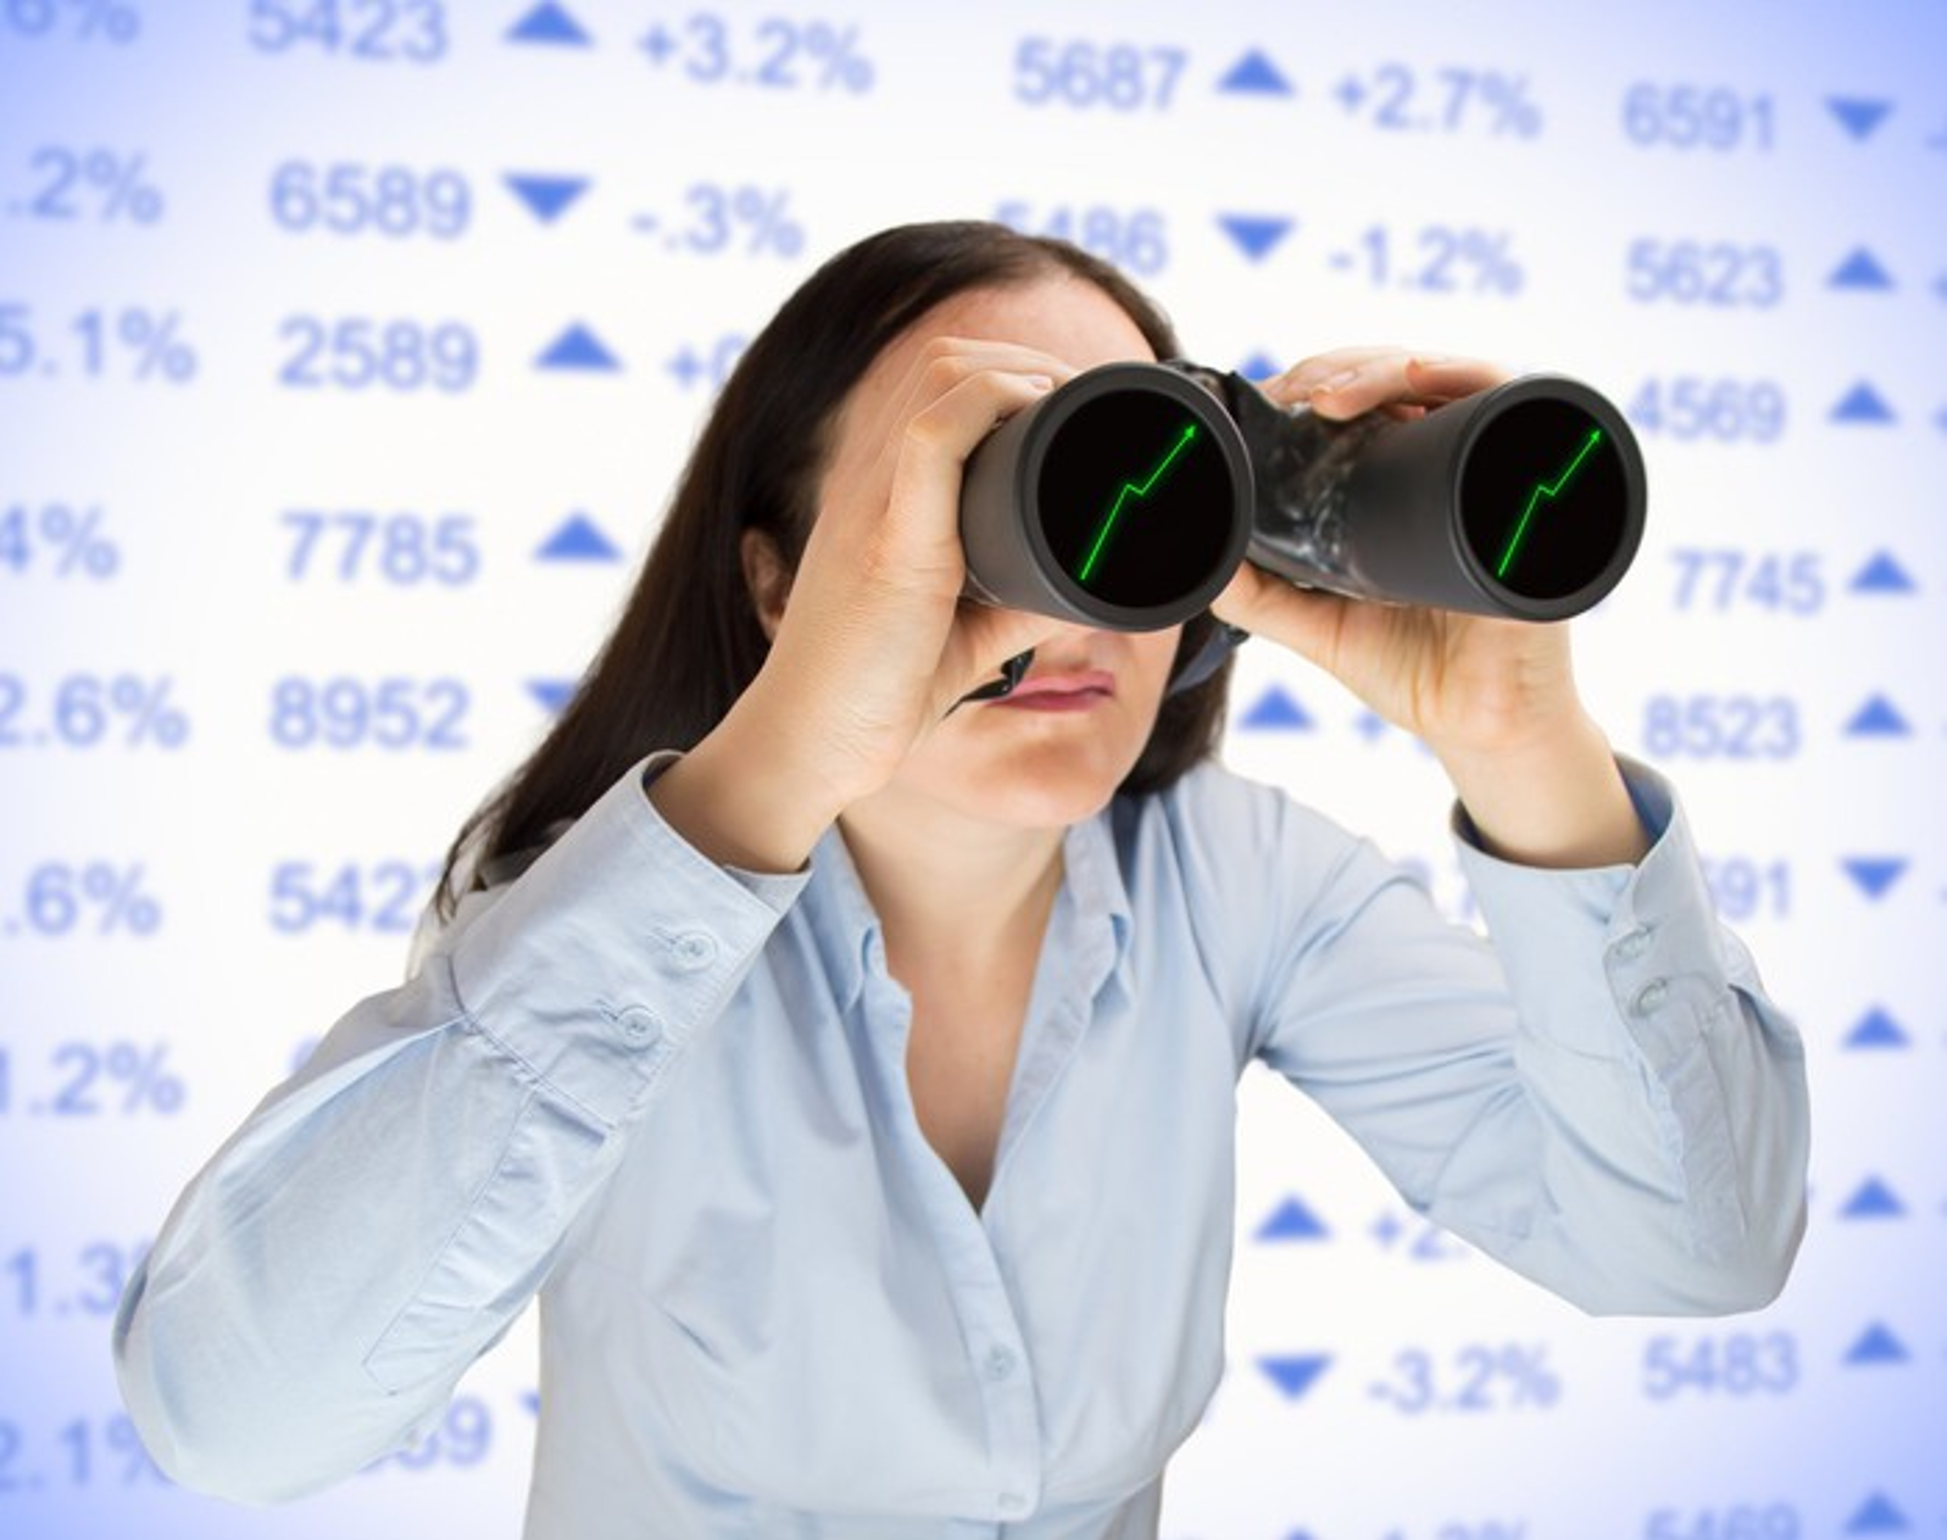 Investor looking through binoculars.